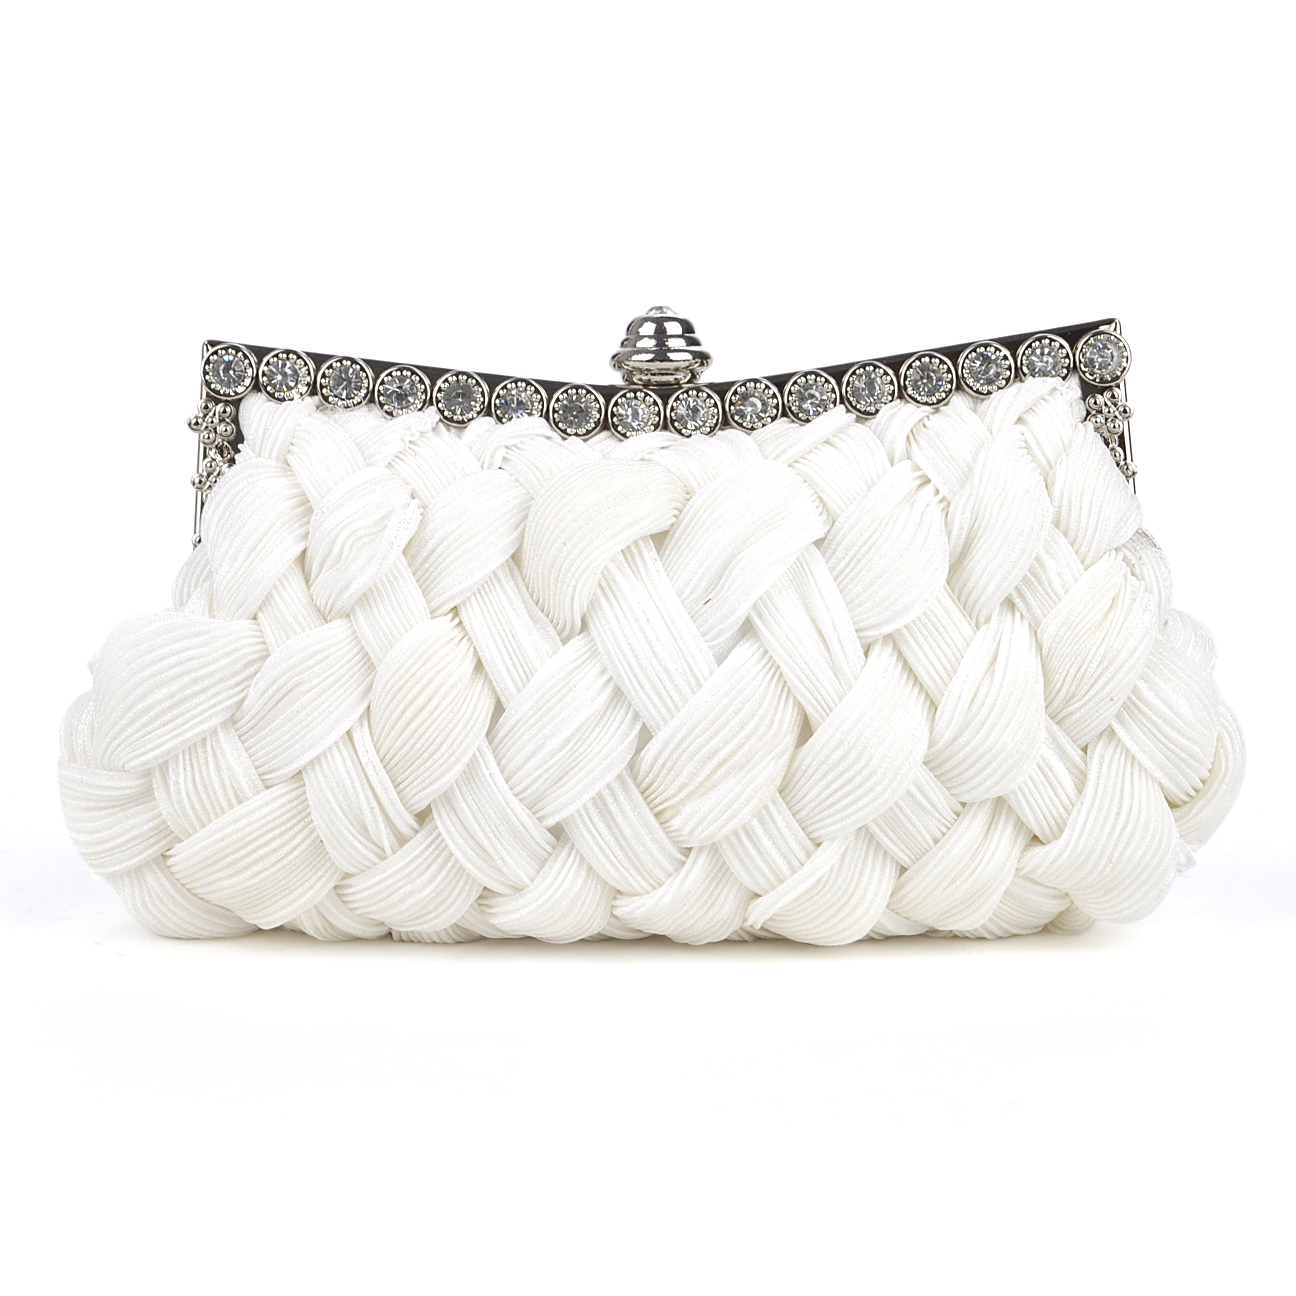 TopTie Woven Pattern Satin Evening Bag - White, Gift Idea